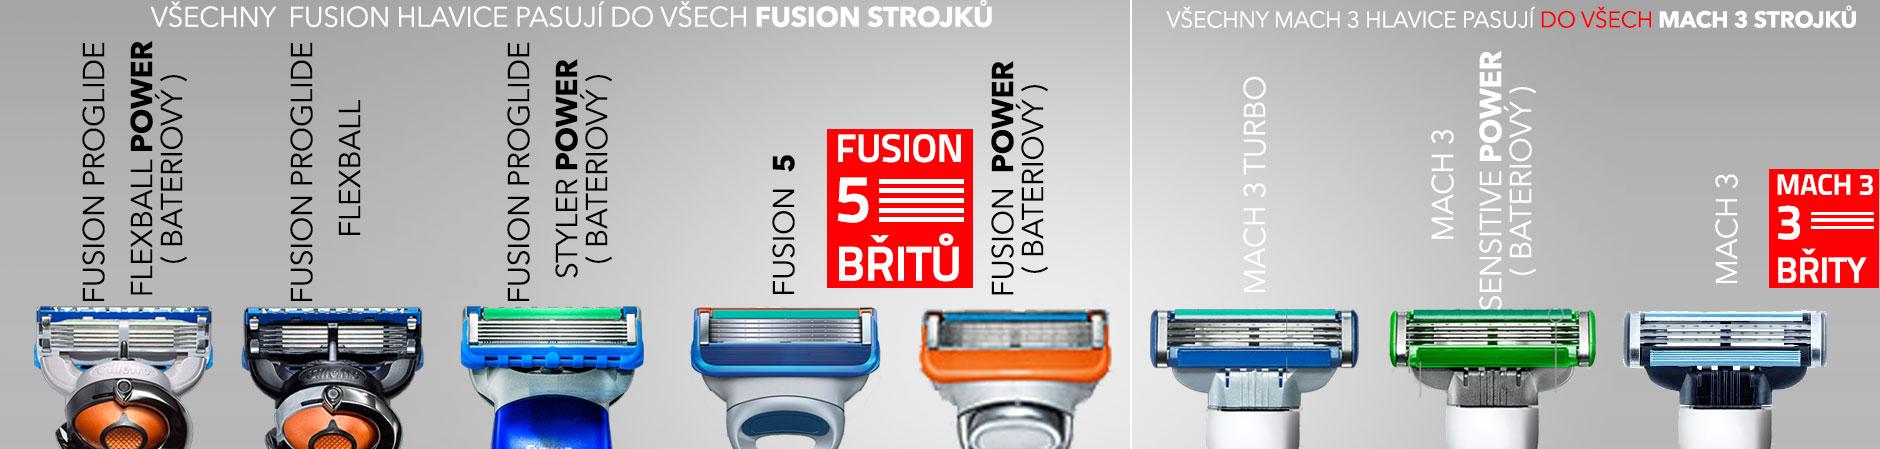 fusion hlavice